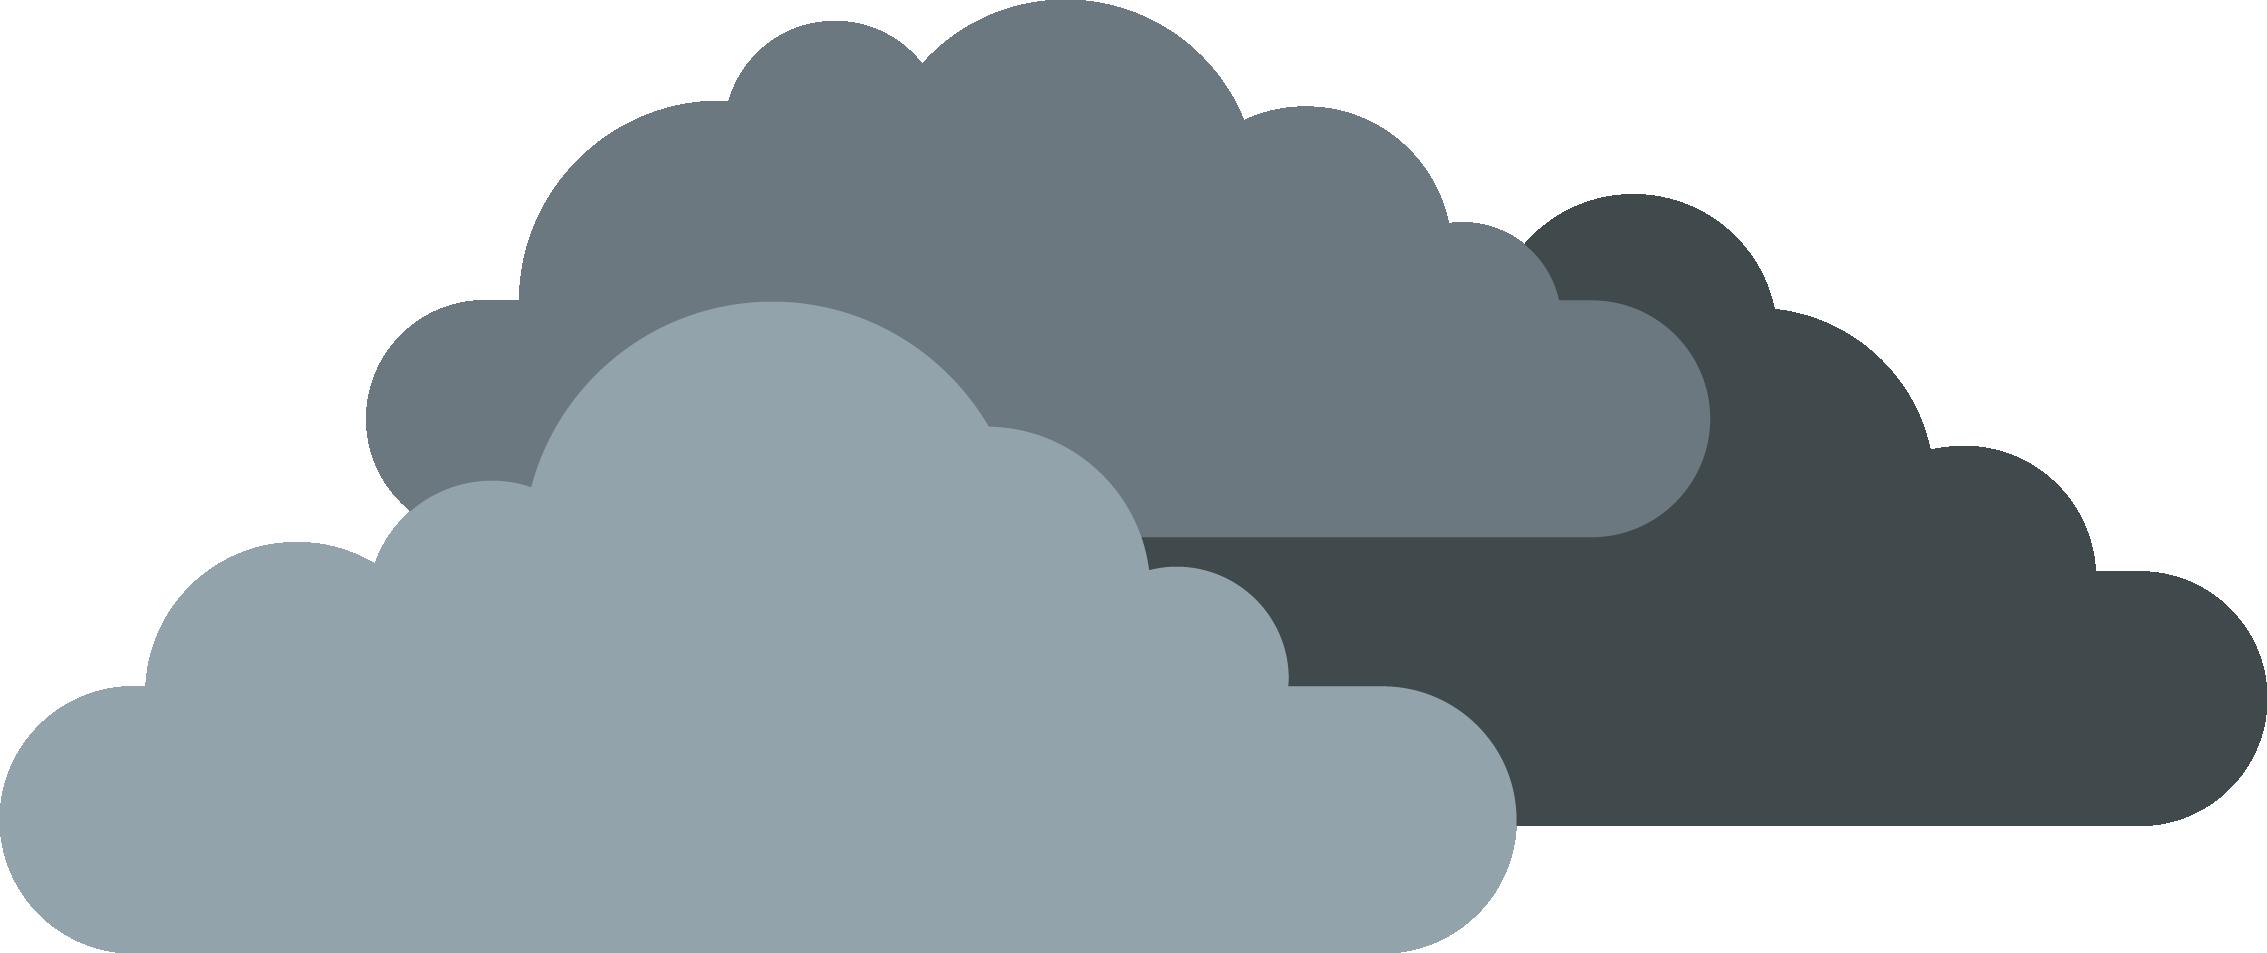 Download Cloud Drawing Illustration - Dibujos De Nubes